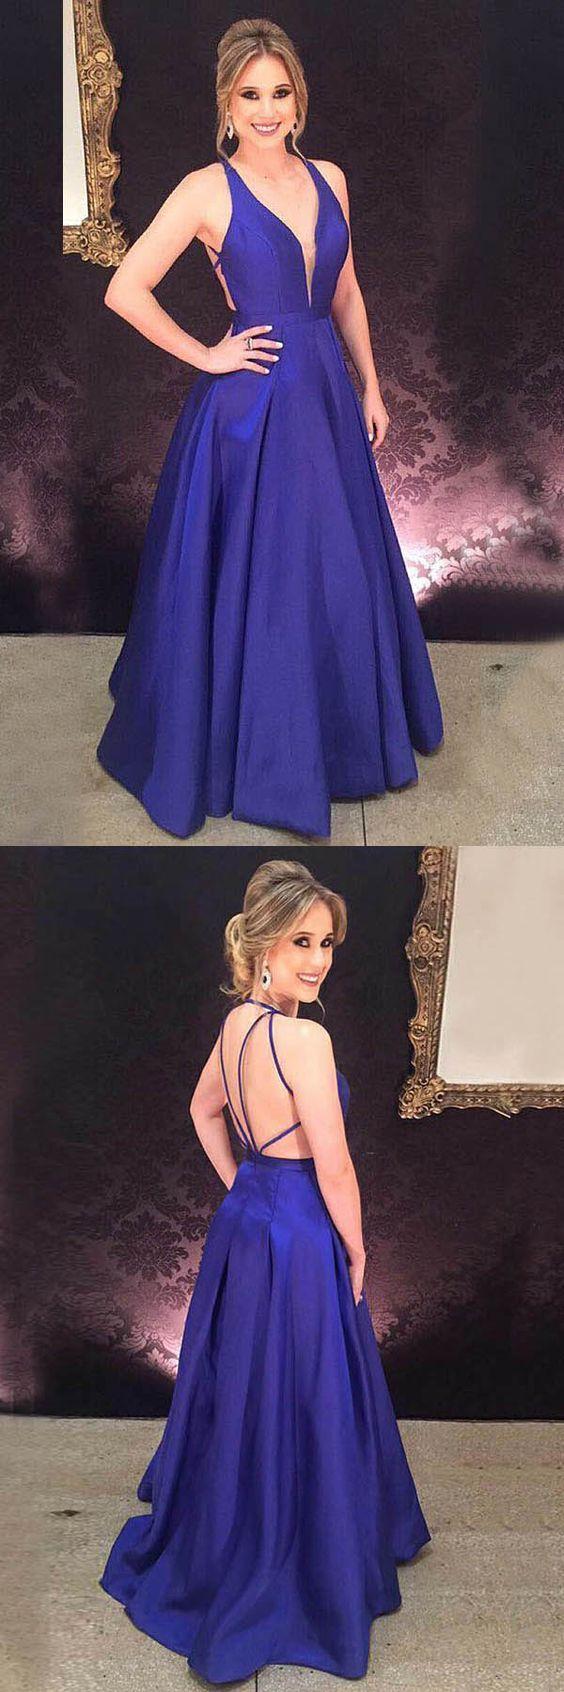 Aline deep vneck royal blue satin pleats prom evening gown